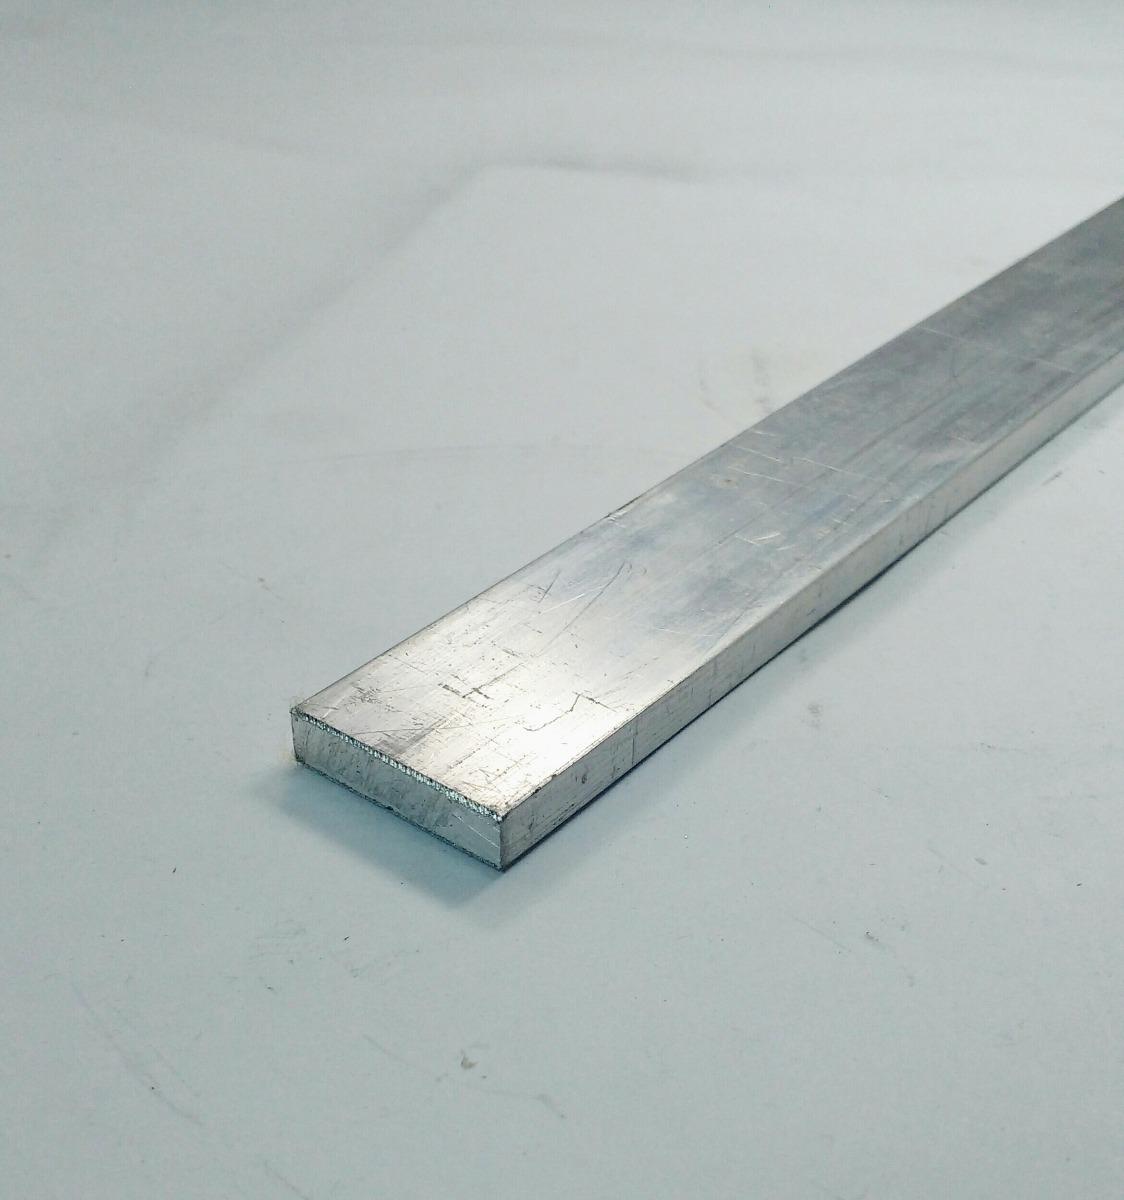 Barra chata aluminio 1 x 1 4 2 54cm x 6 35mm c 1mt r - Barras de aluminio huecas ...